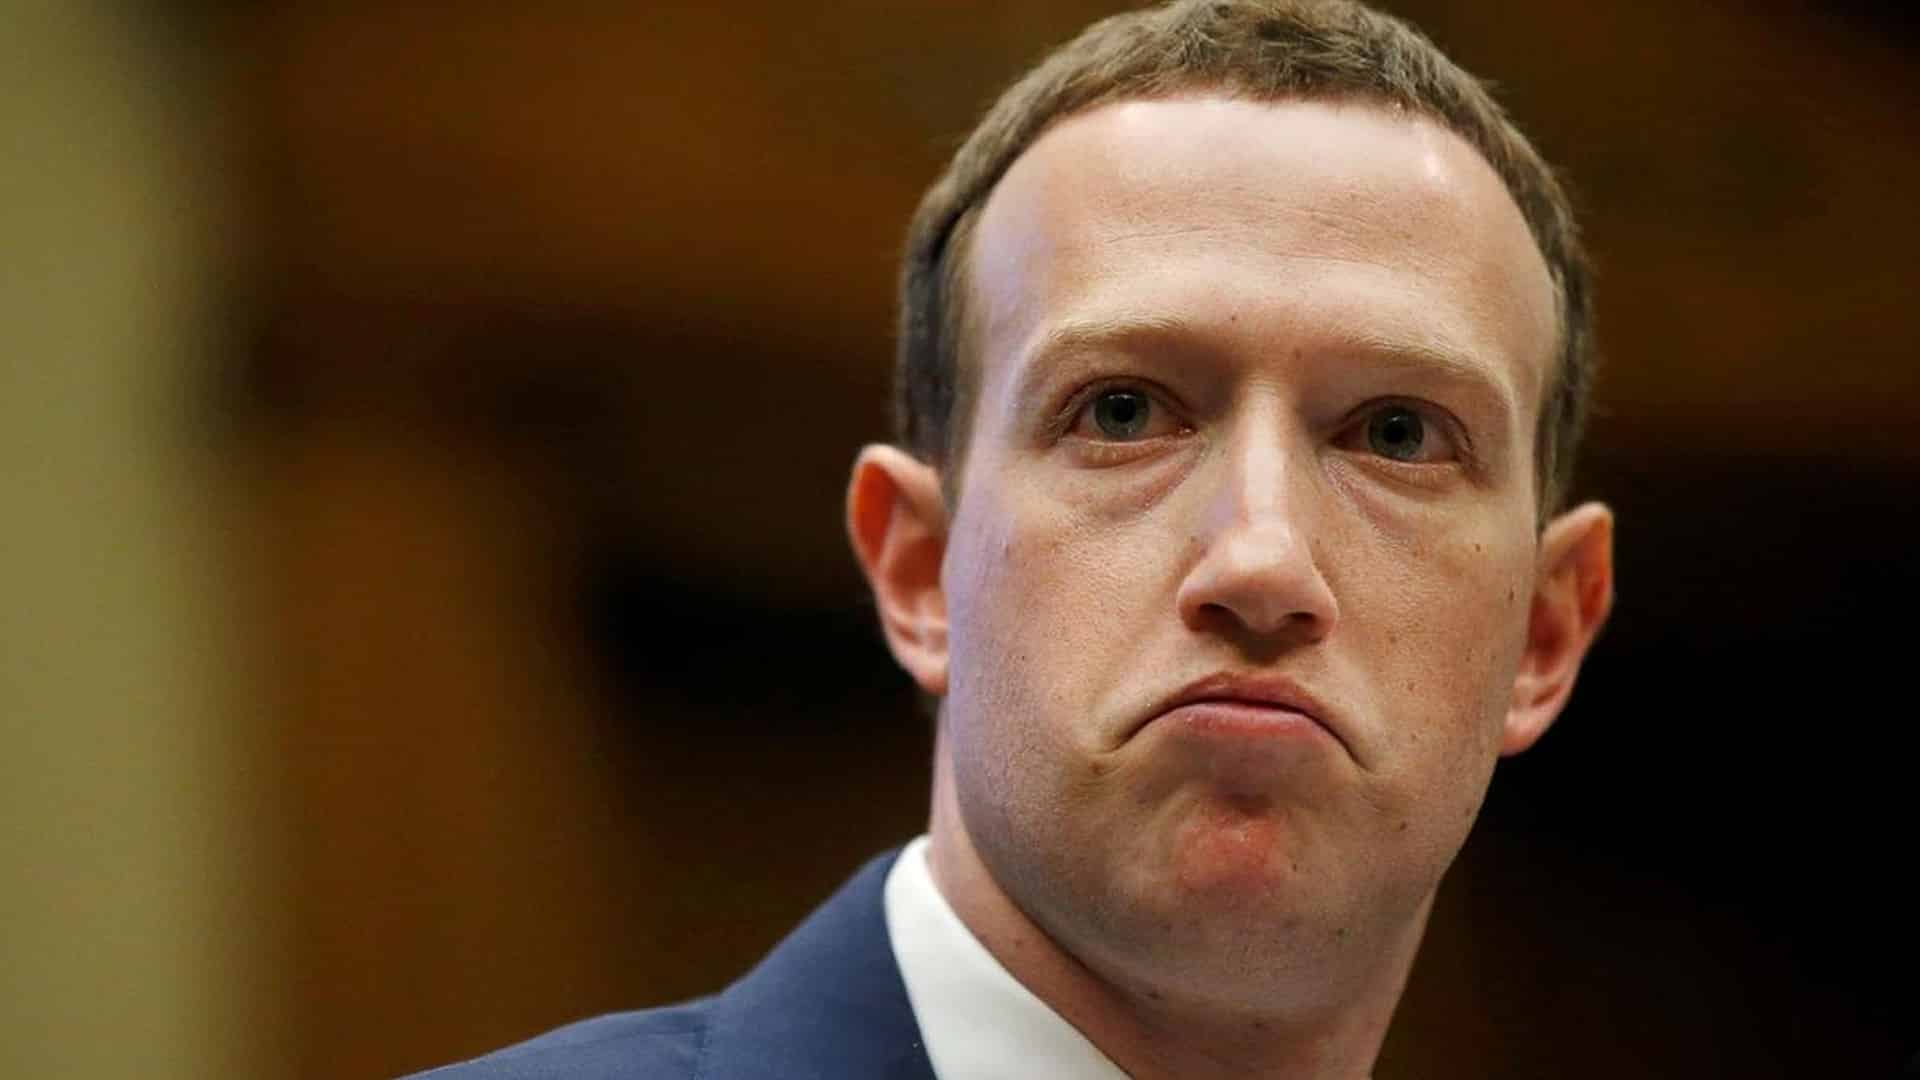 Kryptomena Libra od Facebooku mark zuckerberg